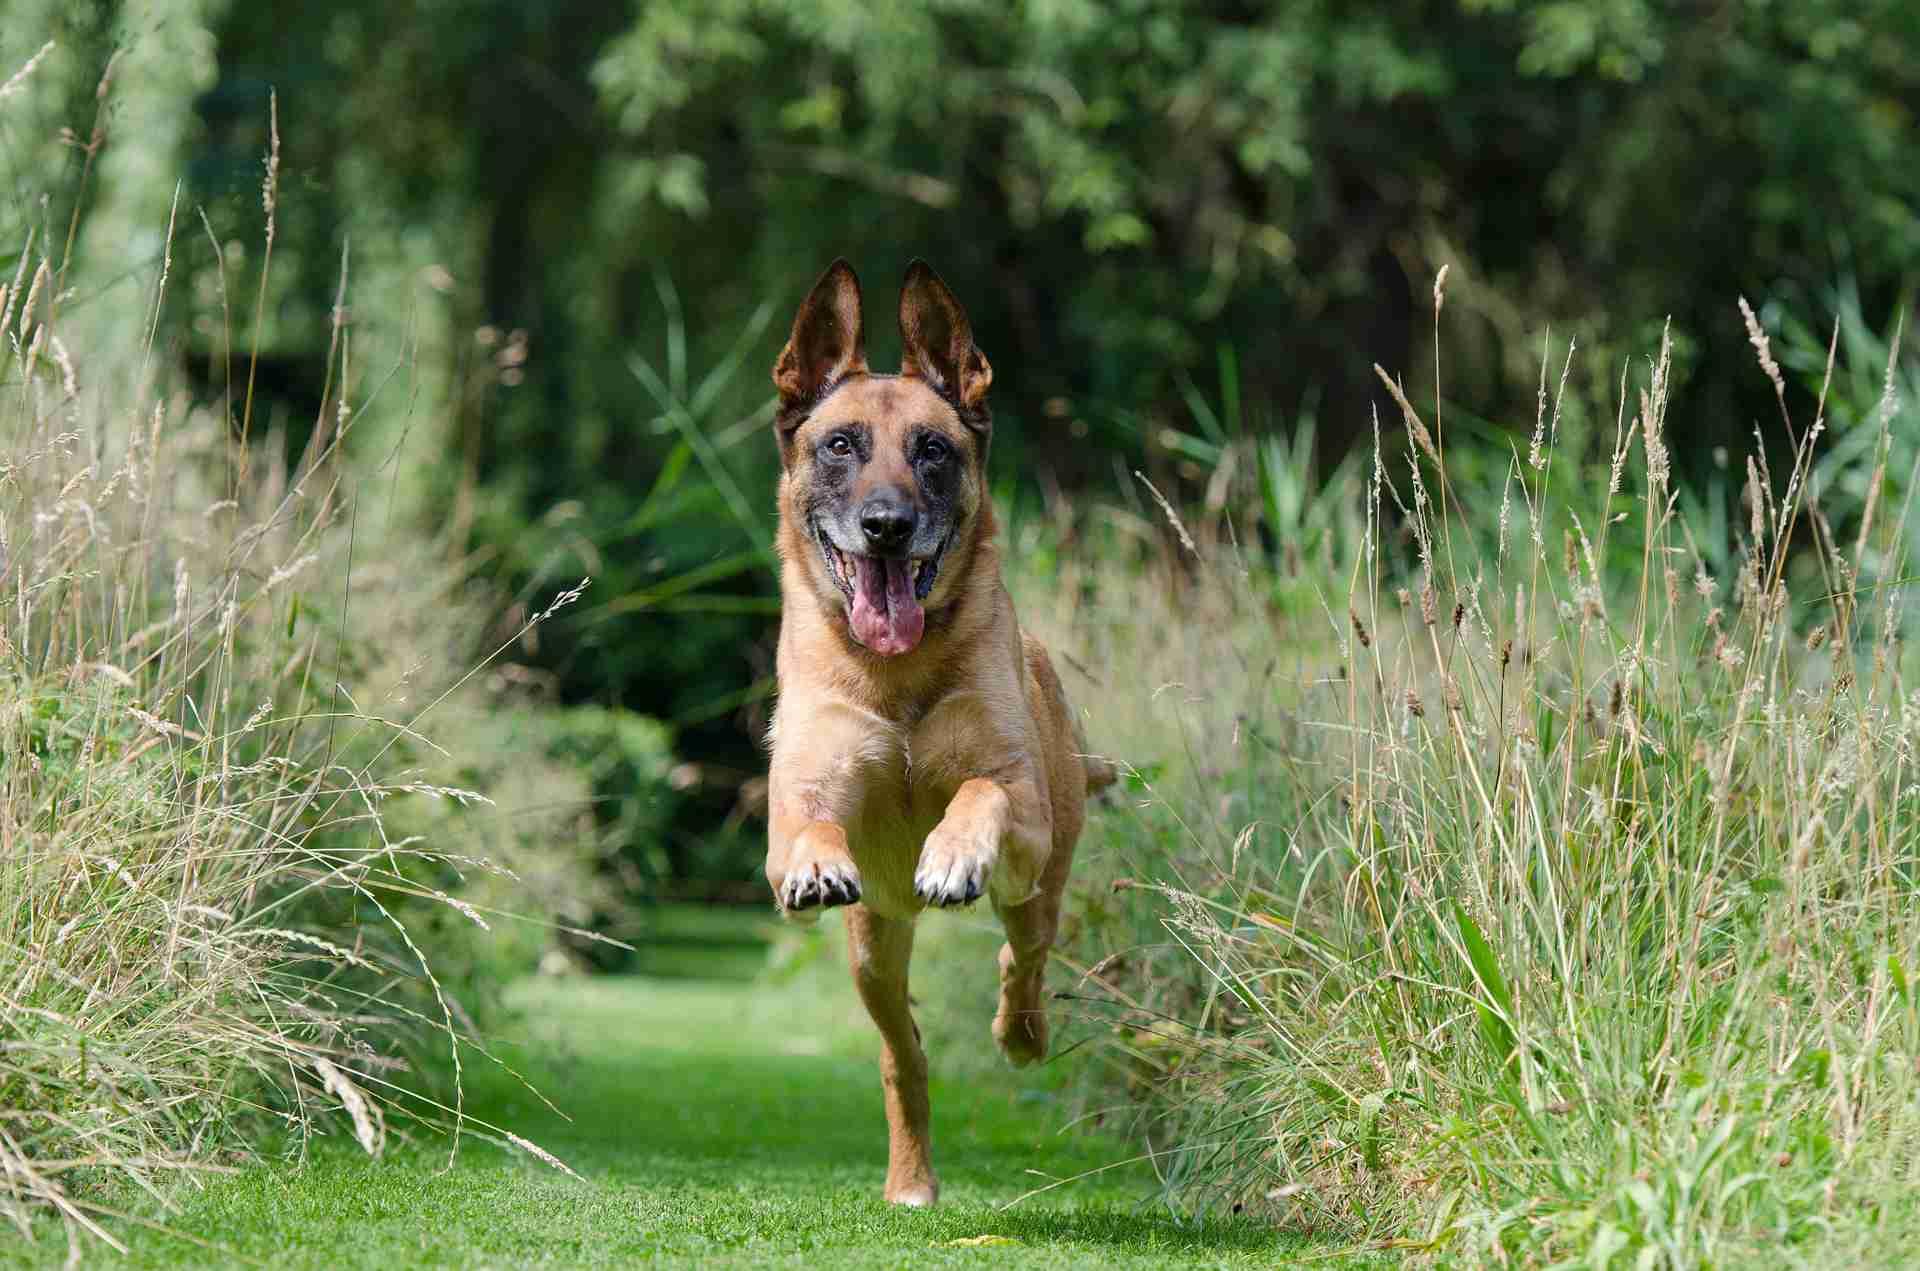 Dog running across the green